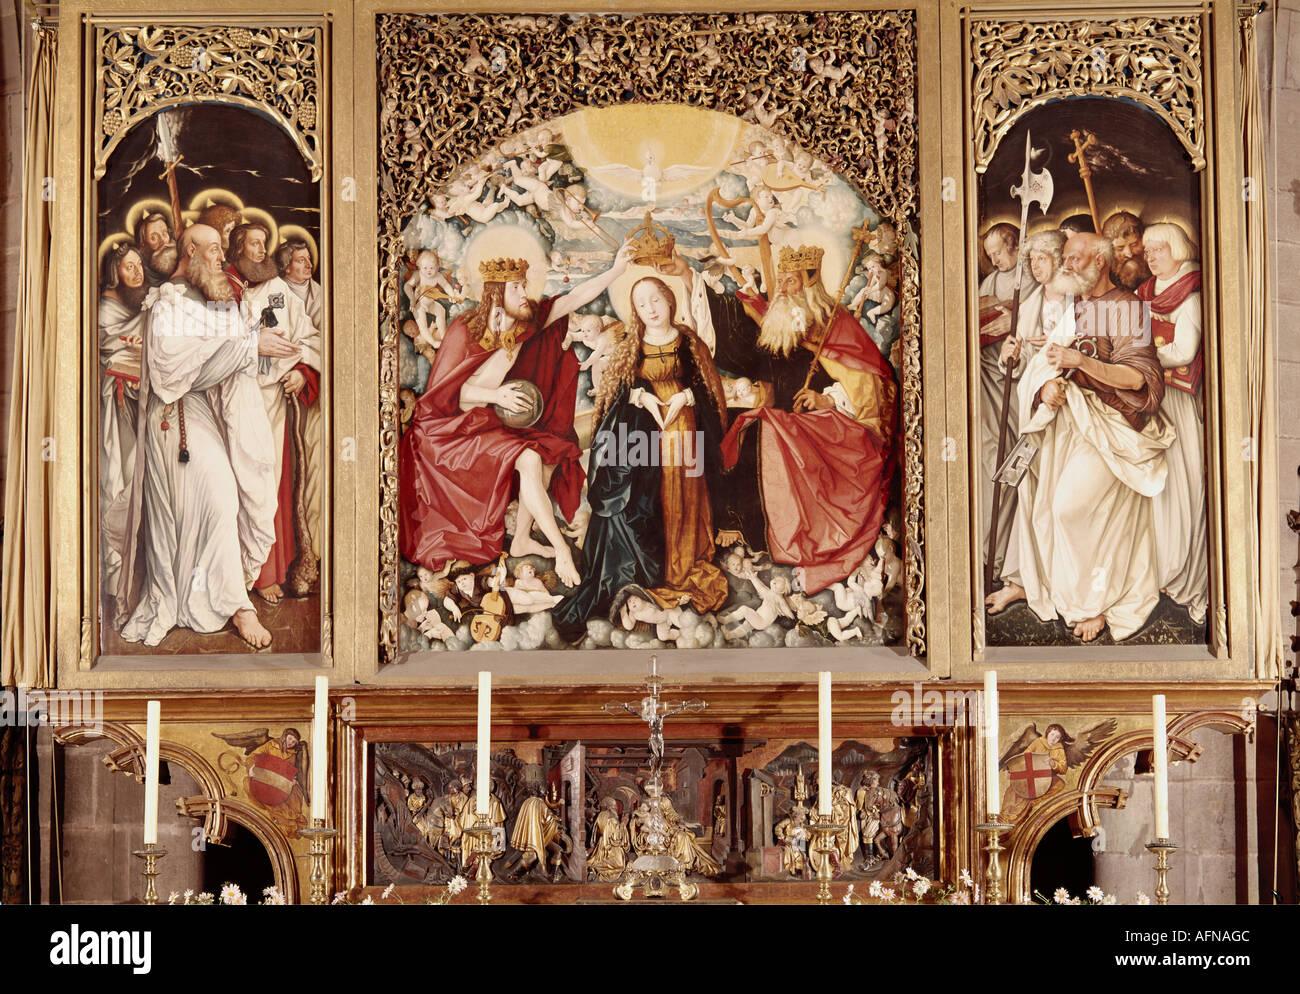 'fine arts, Baldung, Hans called Grien, (1484 / 1485 - 1545), painting, 'Krönung Mariens', ('coronation of Saint Mary'), 151 - Stock Image